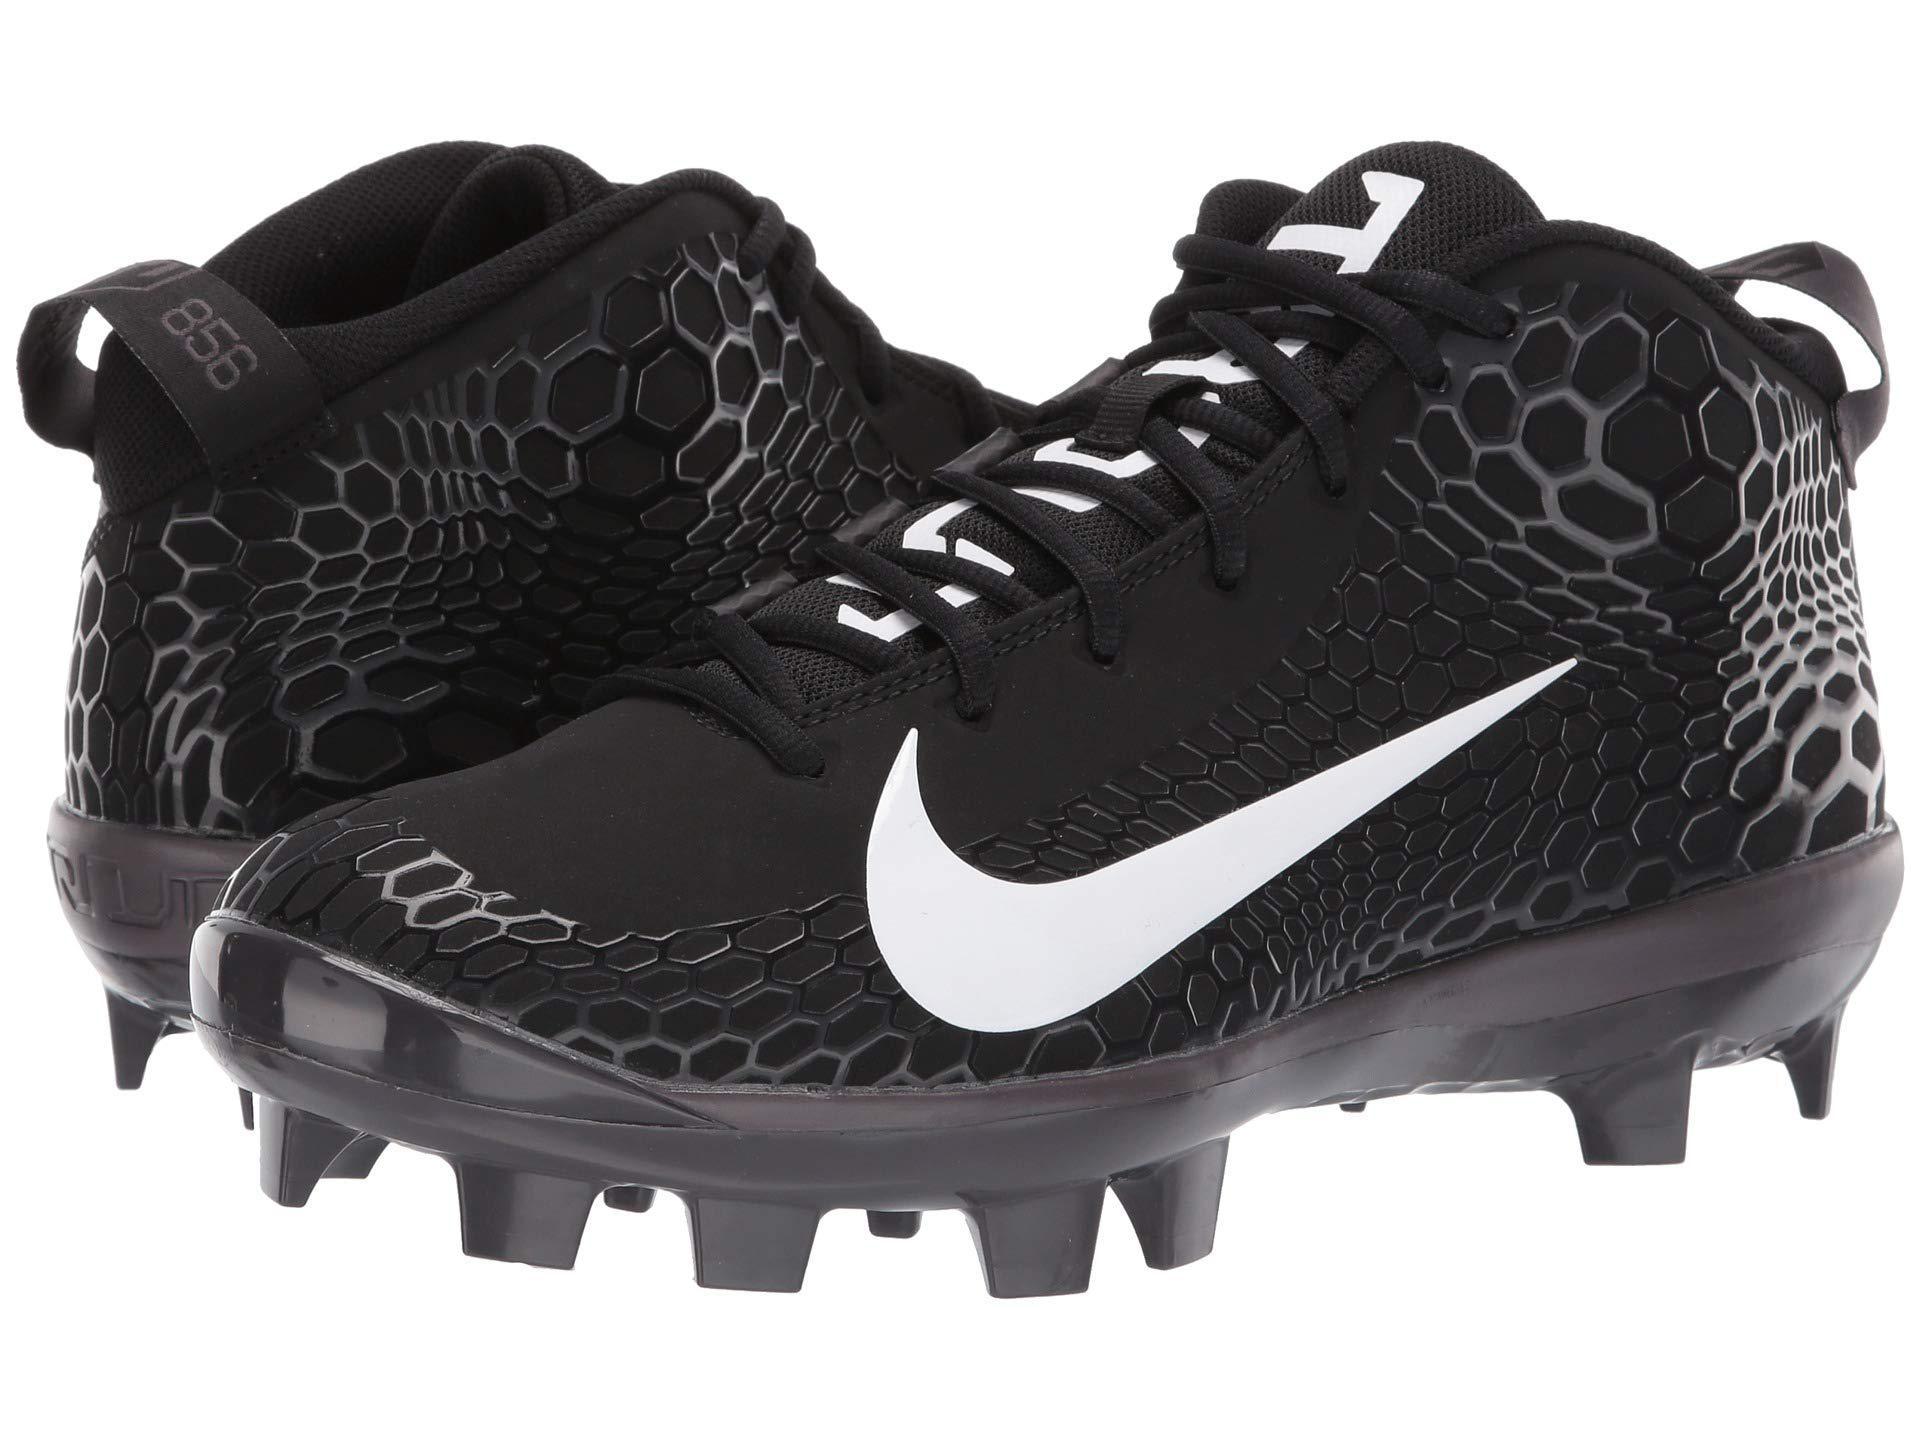 new styles 46c0c fff7f Nike Force Zoom Trout 5 Pro Mcs (university Red white black) Men s ...